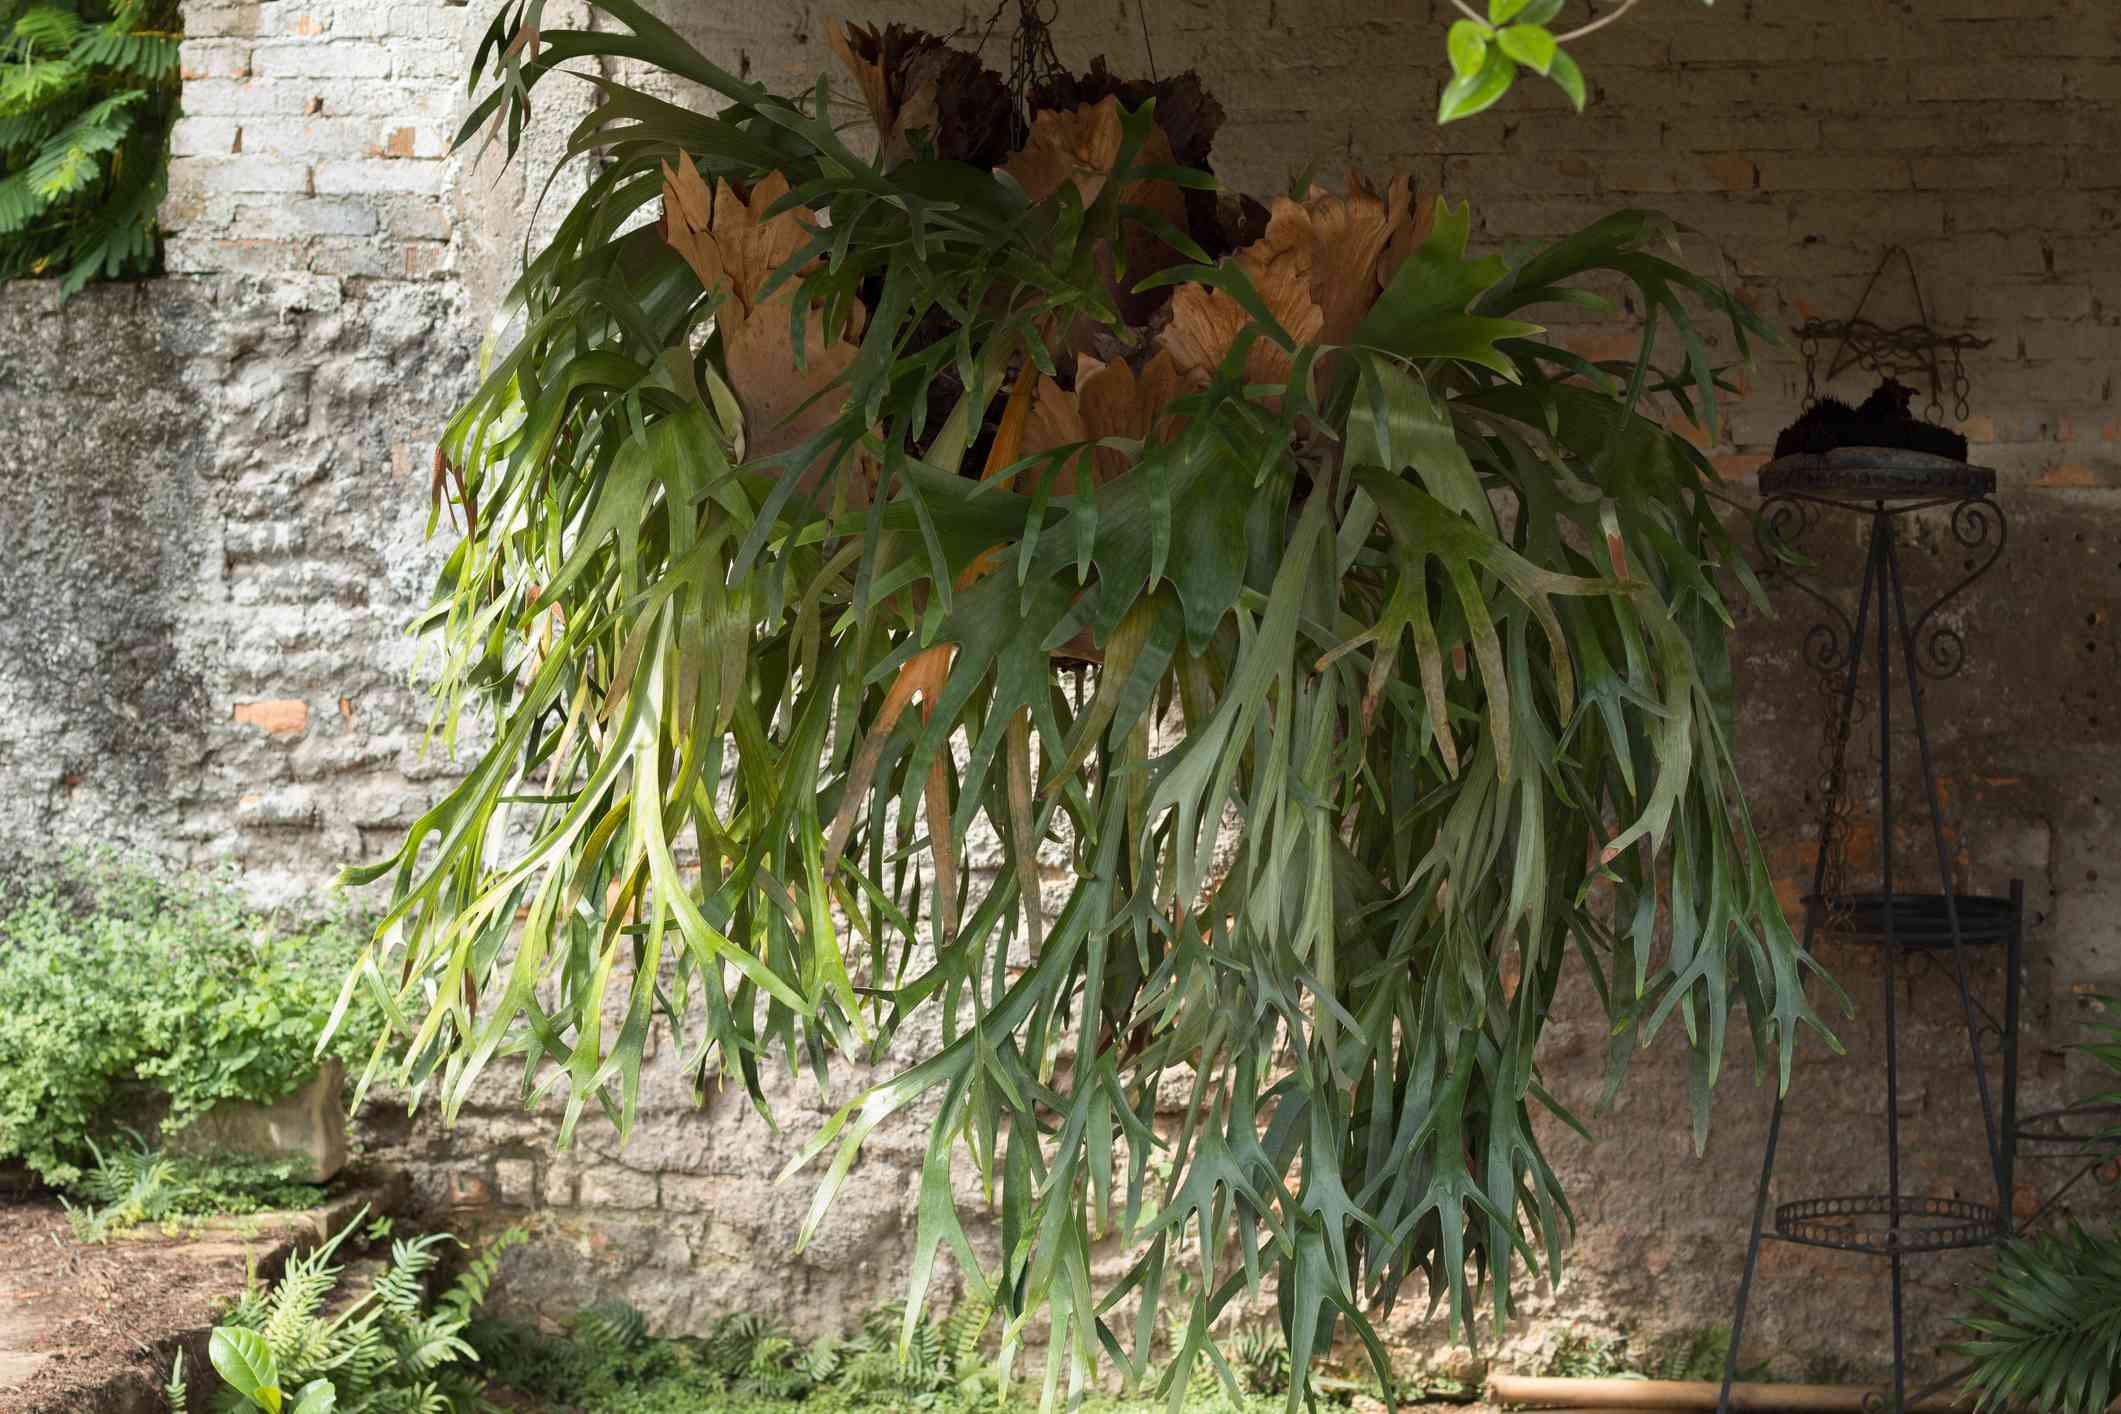 Staghorn fern hanging indoors